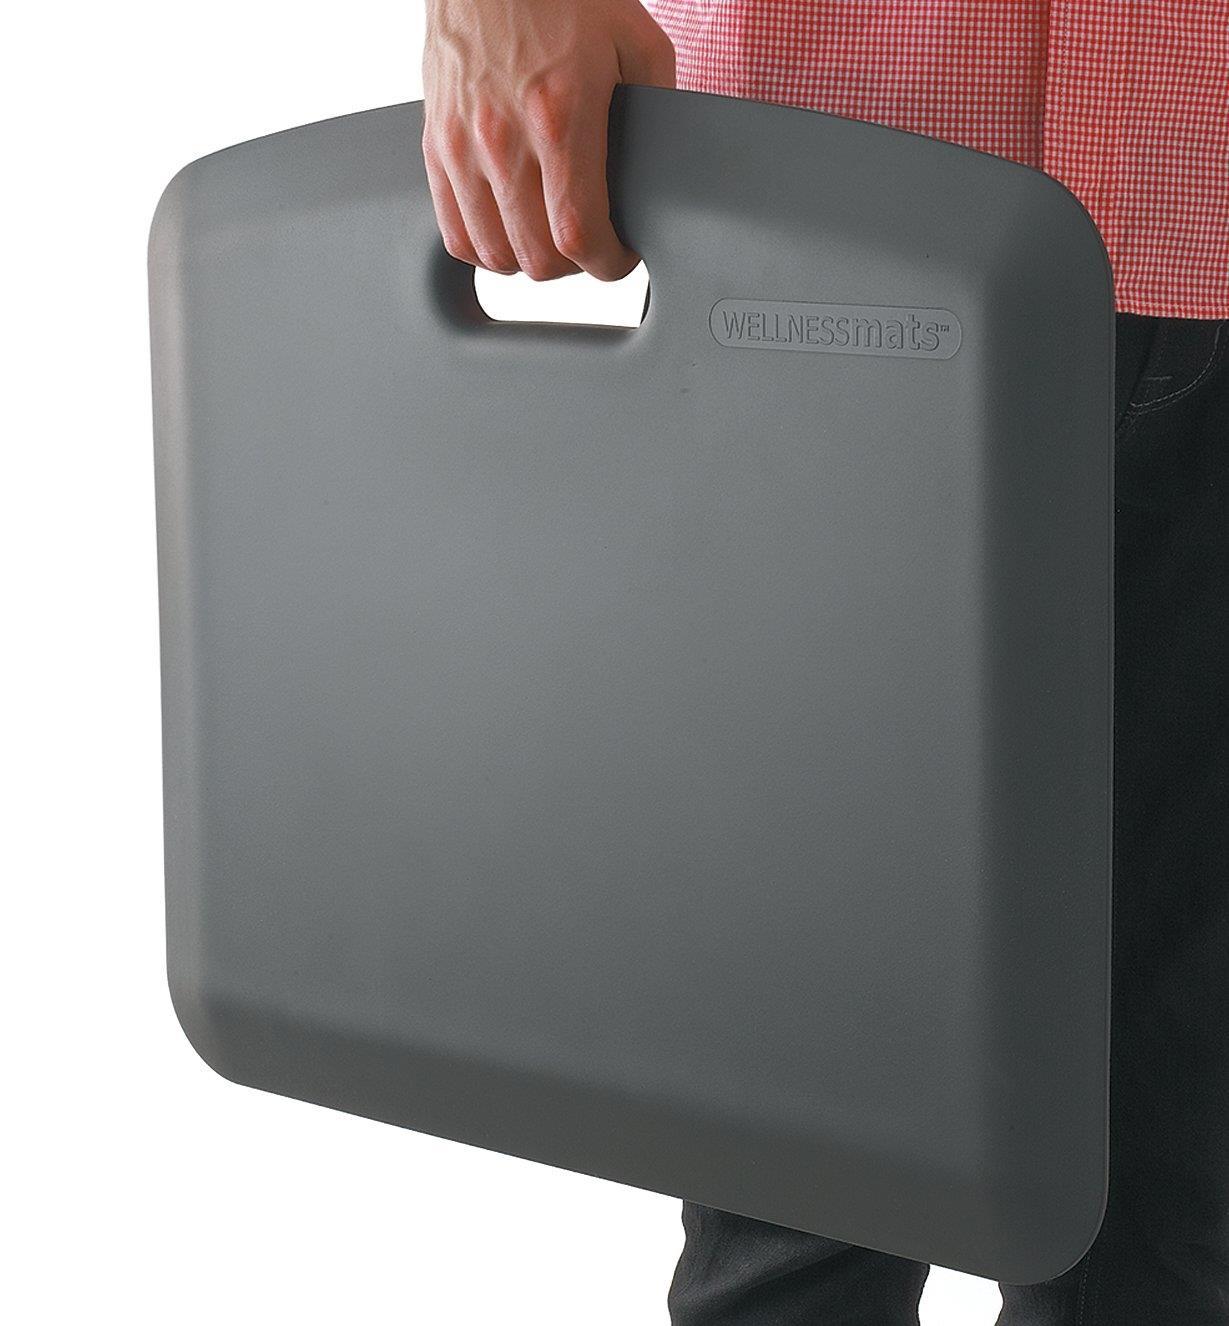 HB168 - Tapis portatif de 18 po x 22 po, gris